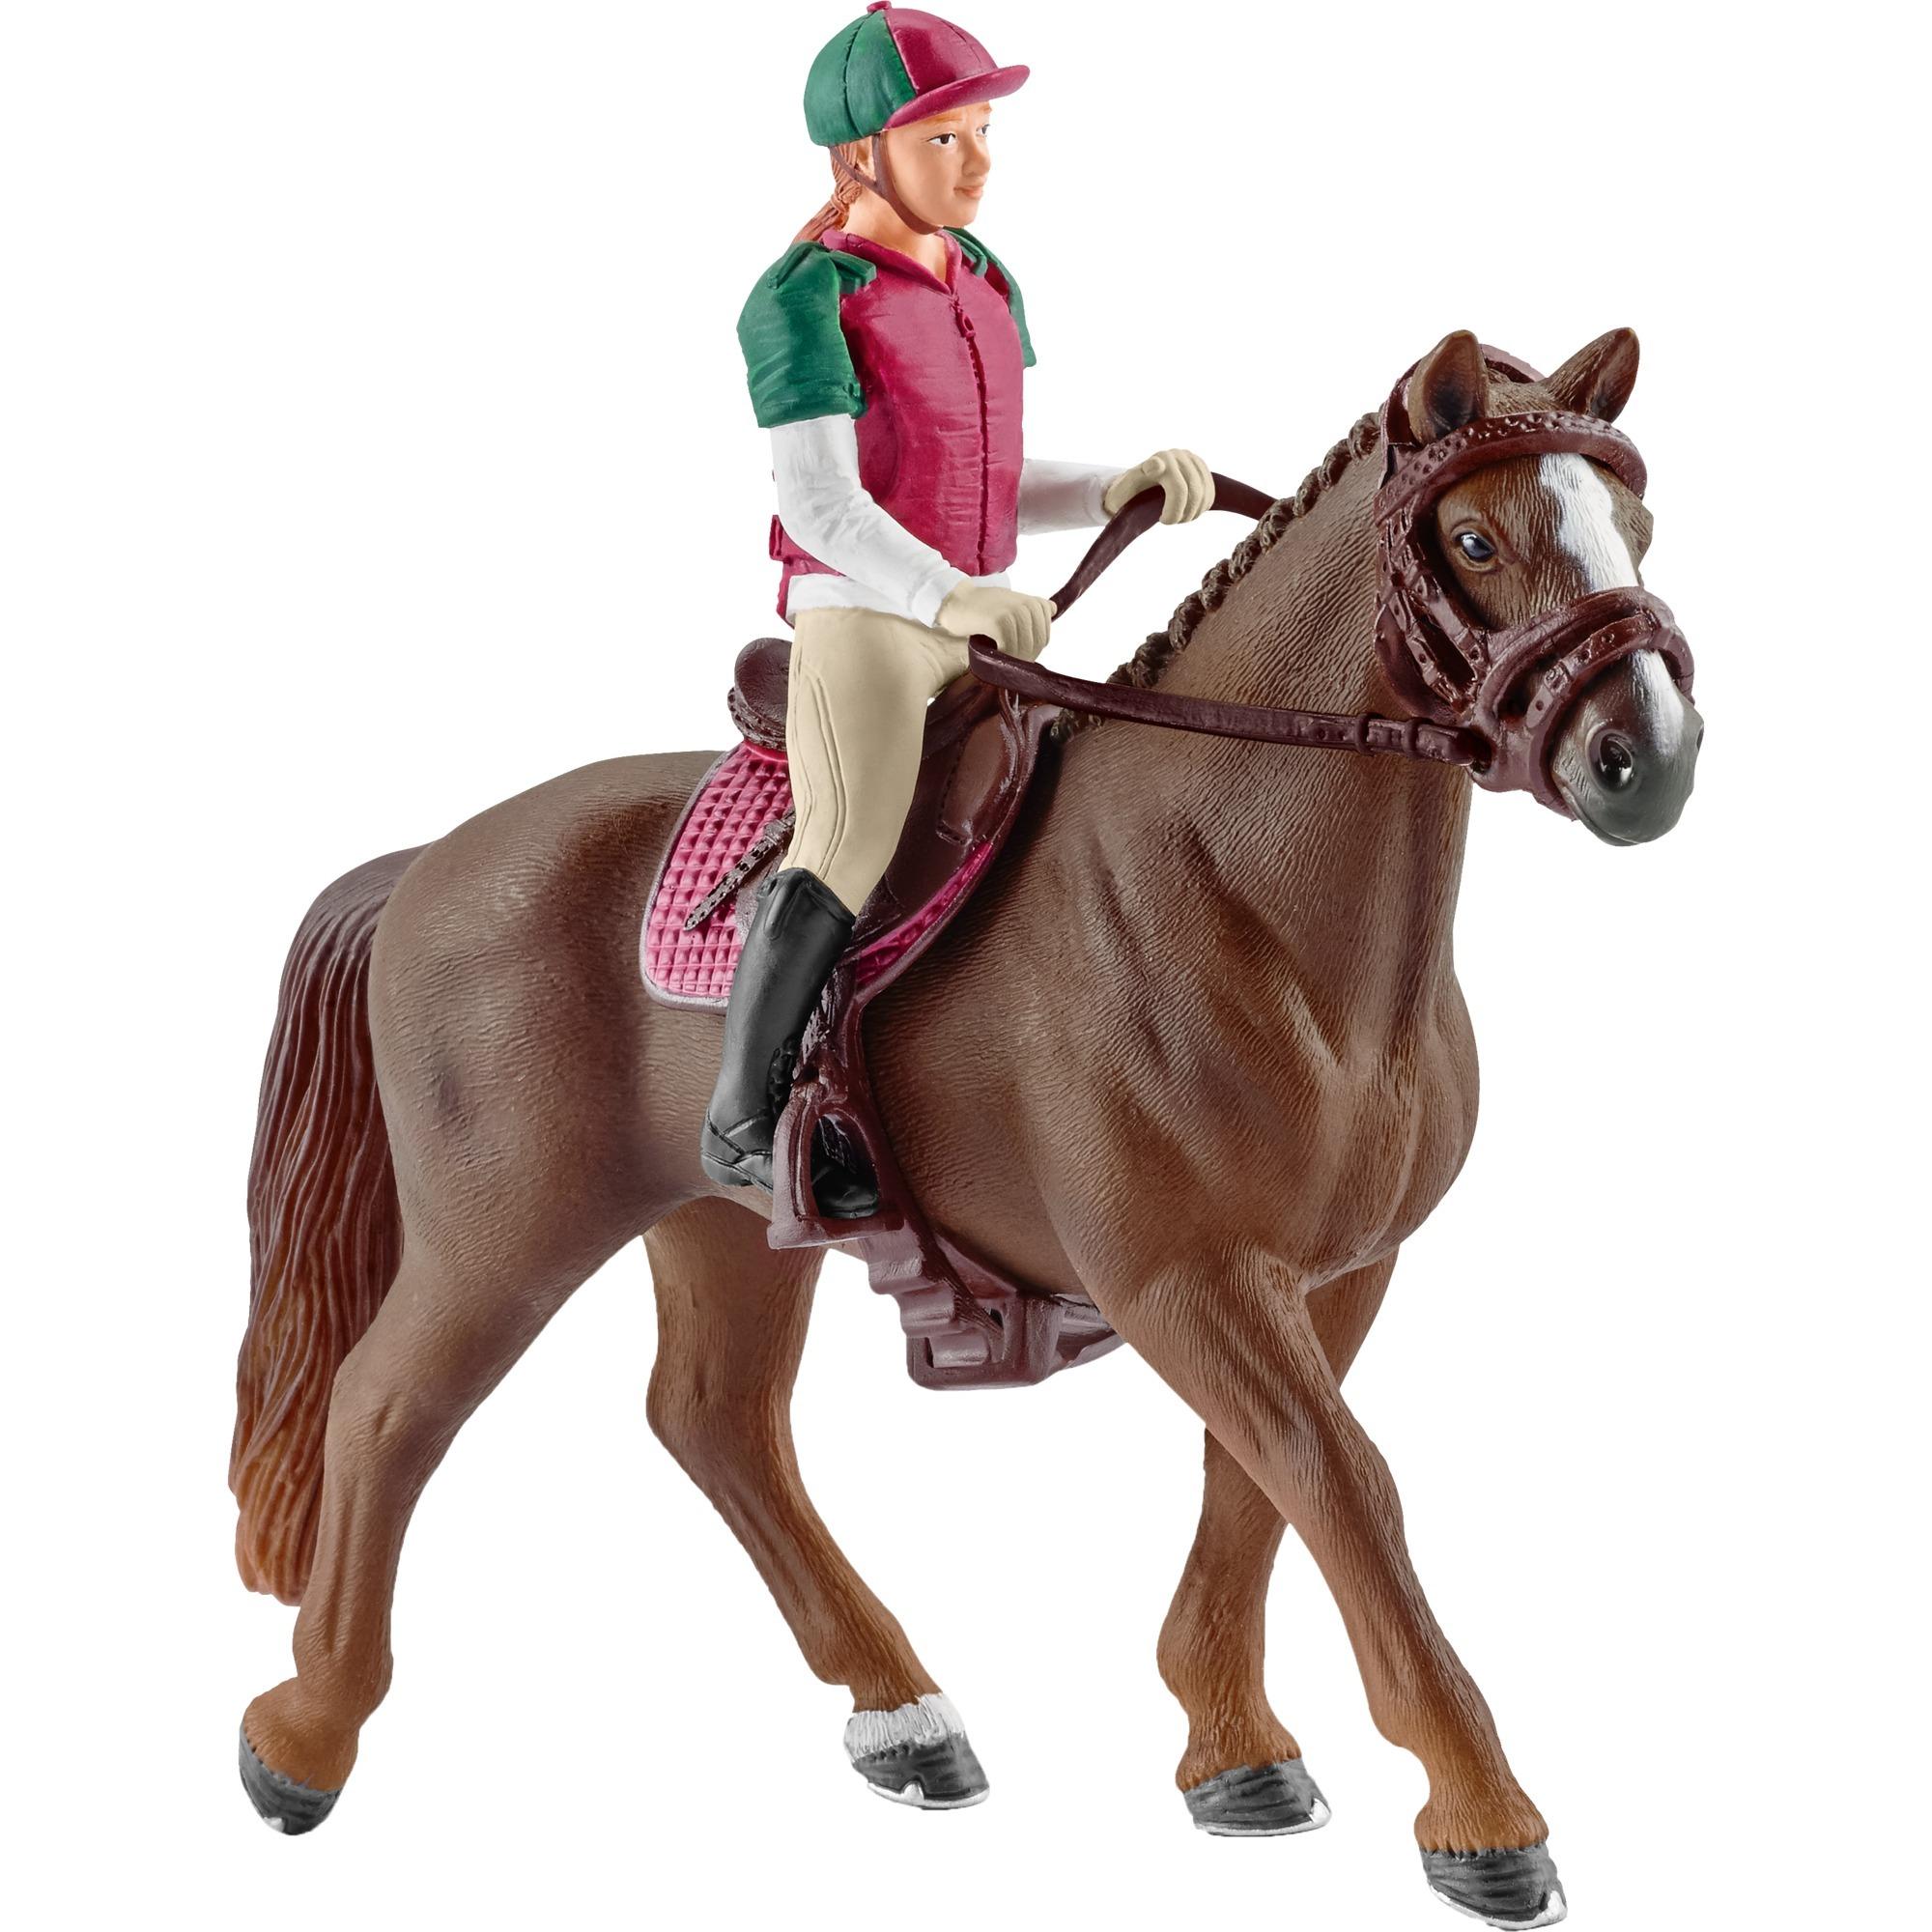 eventing-rider-spil-figur